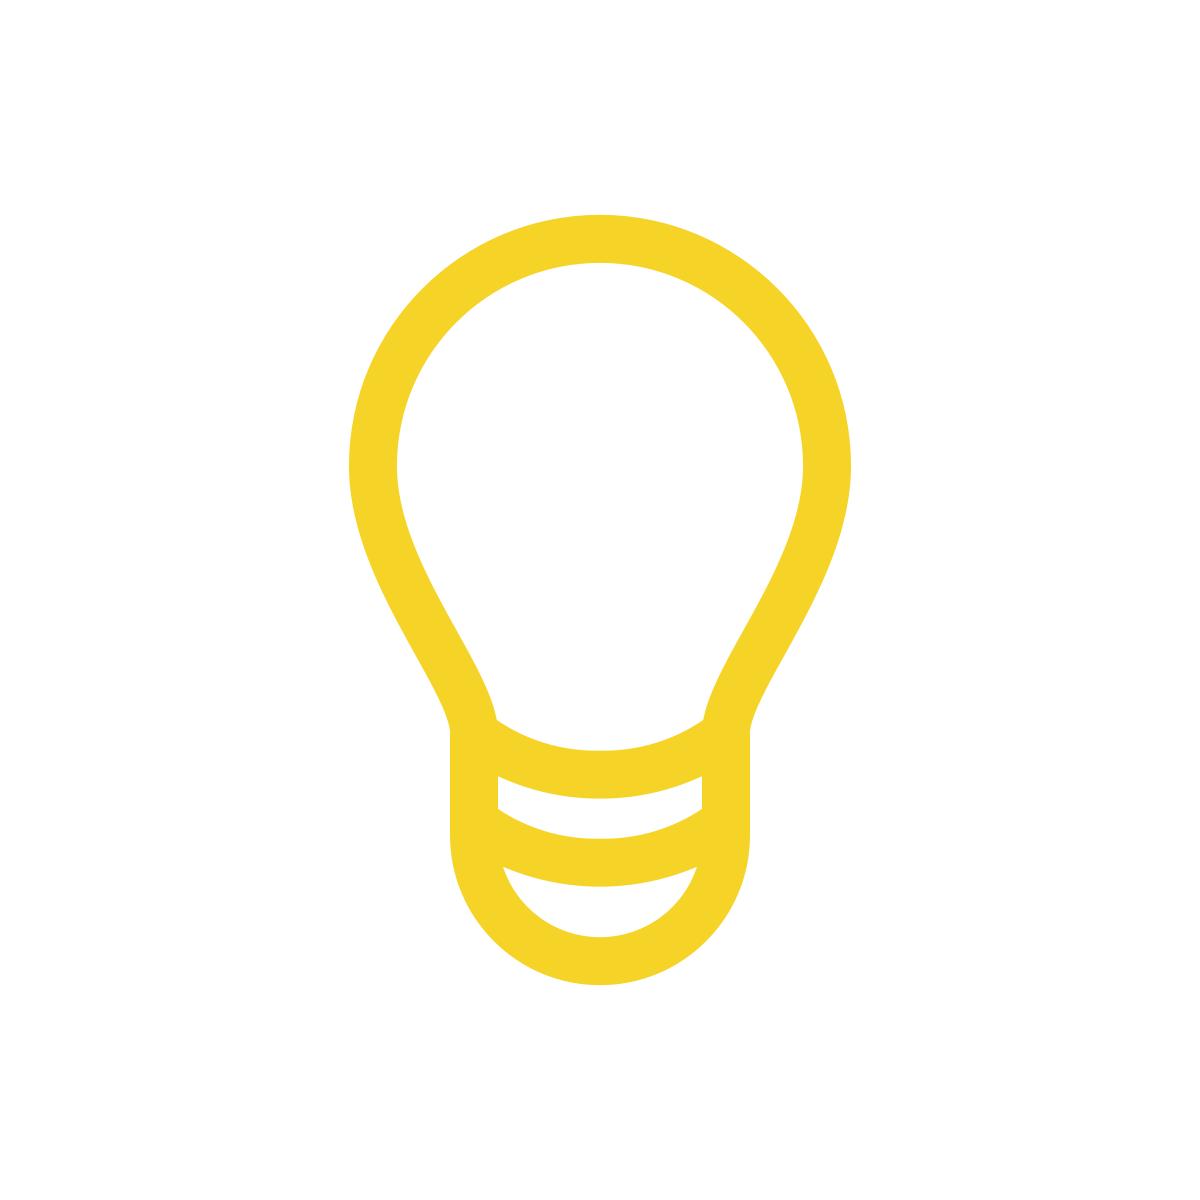 noun_lightbulb_1393368_F5D327.png